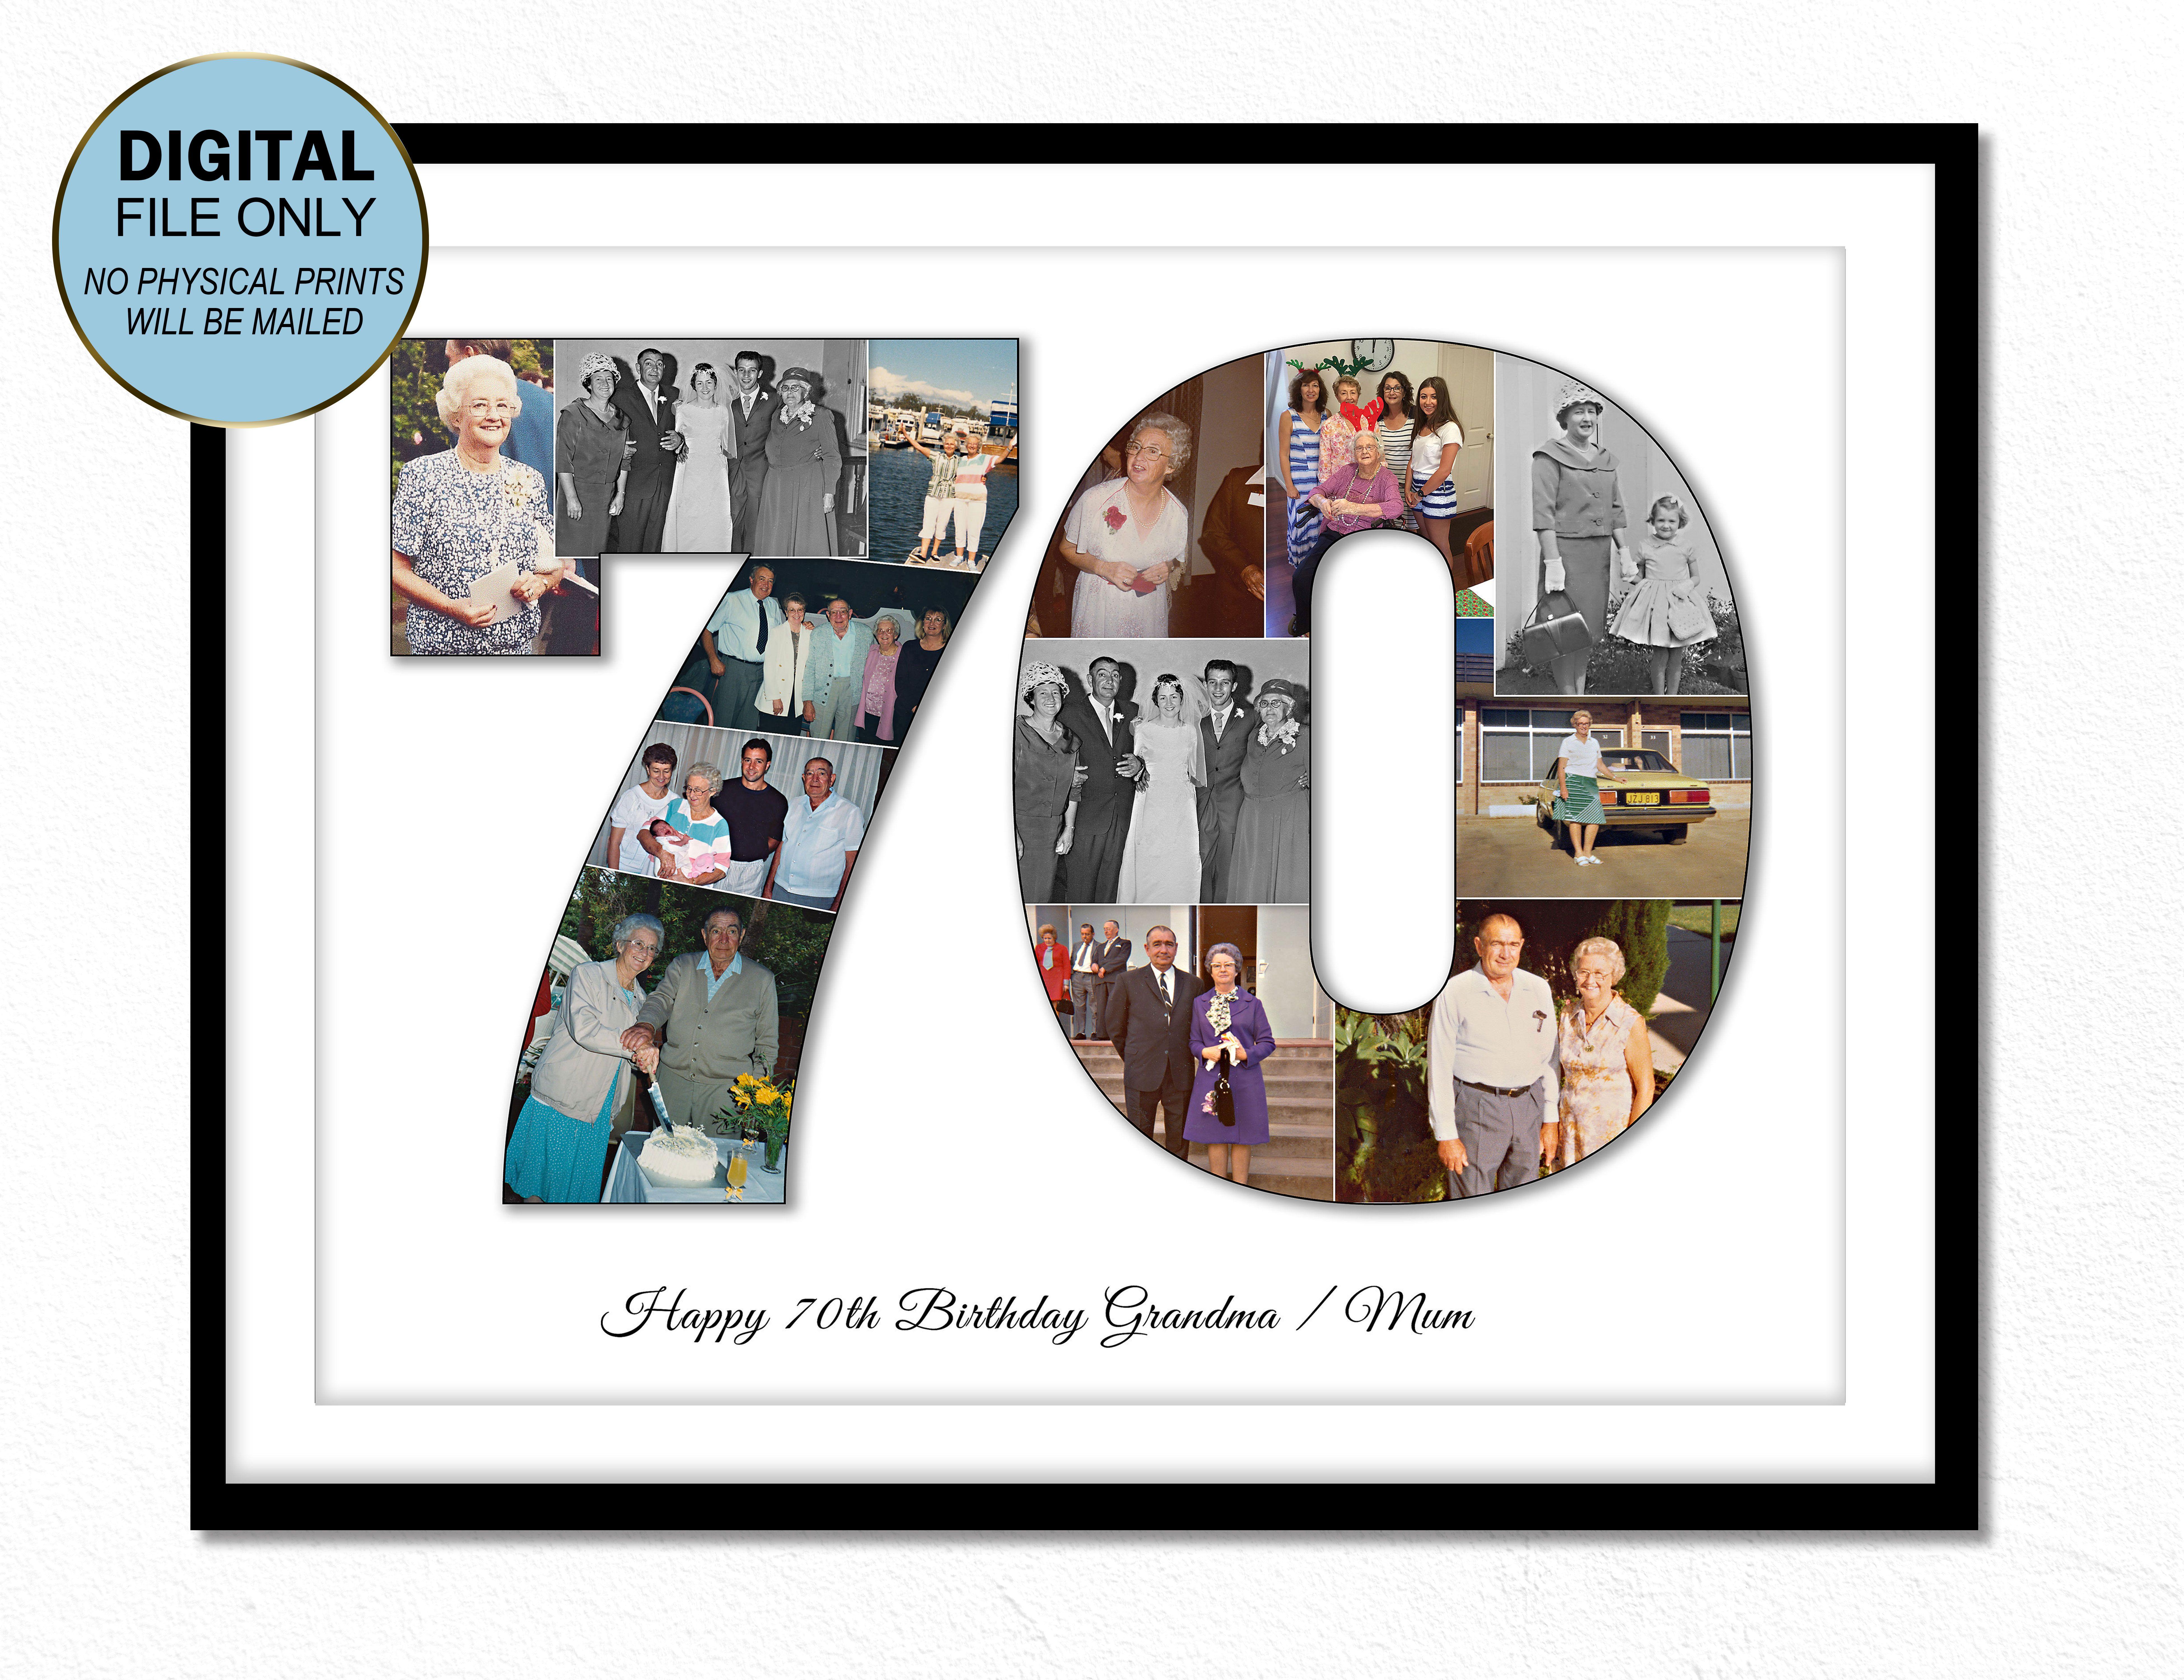 70th Seventy Birthday Gift For Grandma 70th Seventy Gift Ideas Etsy Birthday Photo Collage Birthday Gifts For Grandma Birthday Photos